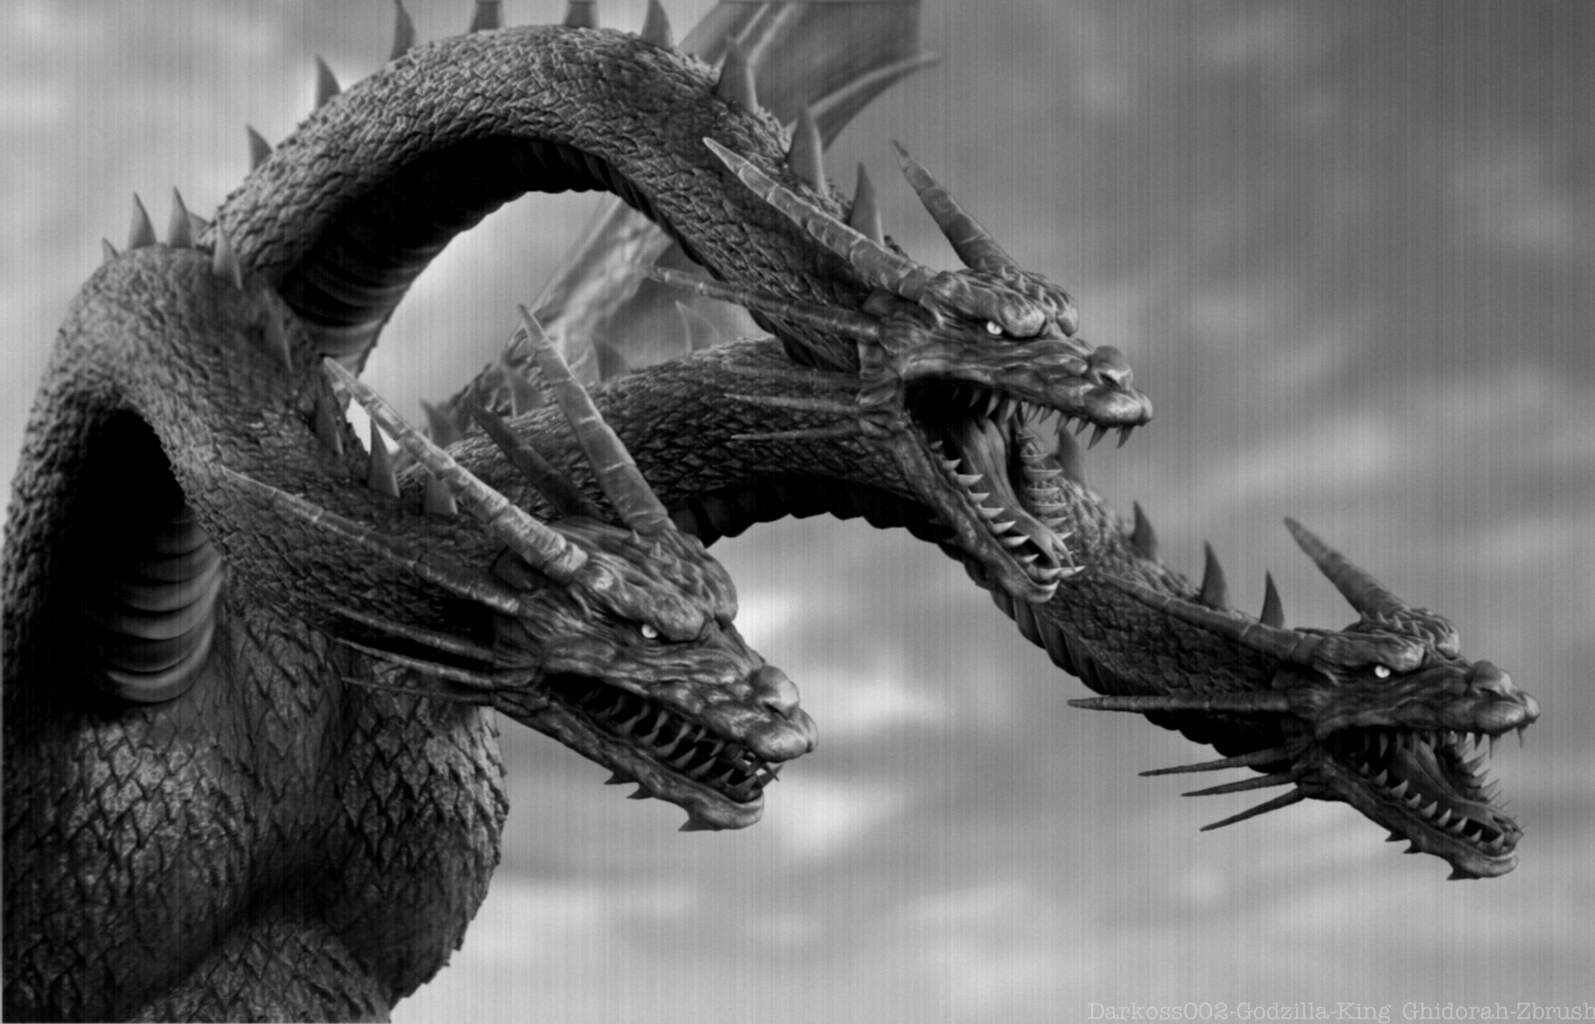 KING GHIDORAH-GODZILLA SERIES-CLASSIC MOVIE by darkoss002 ...